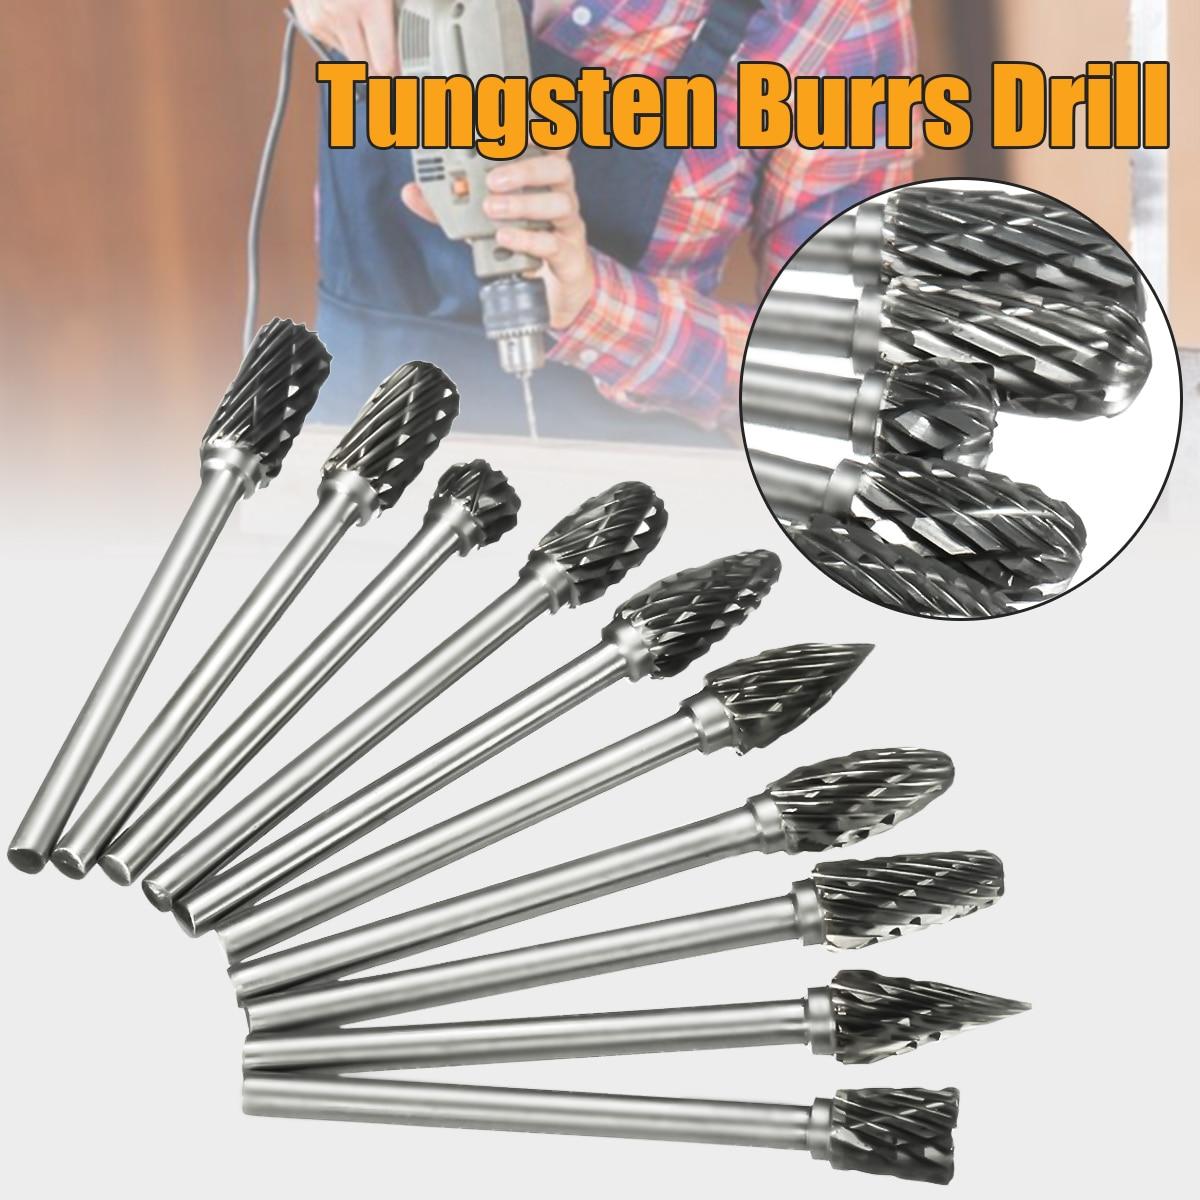 1pcs 10 Model Tungsten Steel Solid Carbide Burrs Rotary Files Diamond Burrs PCB CNC Drill Bit Tool 6mm Hand Tools